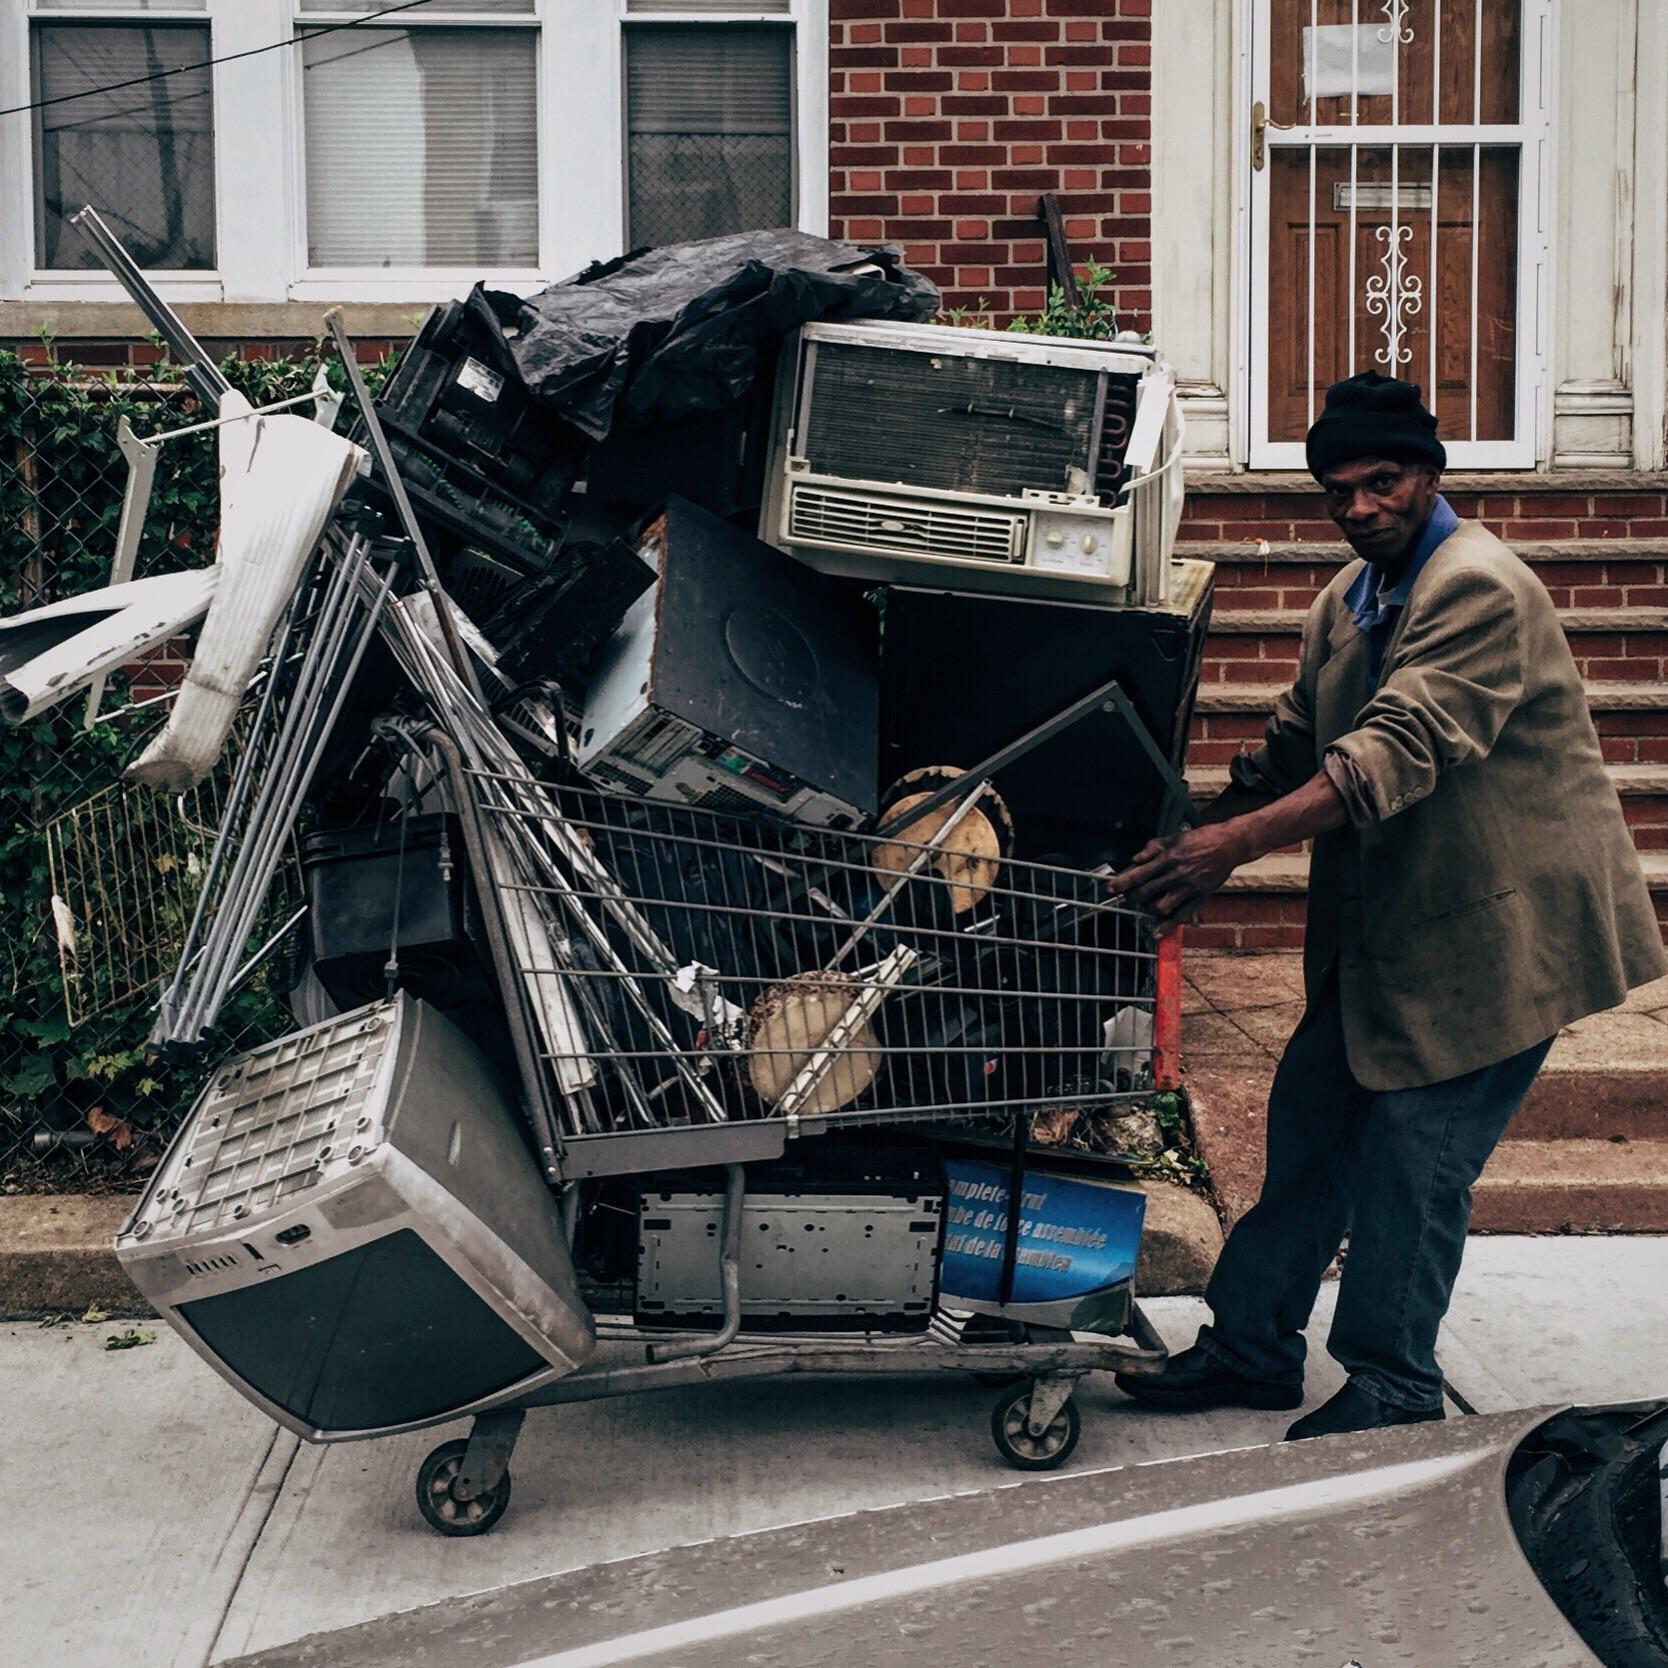 Soho Trendz: Street Photos of the Other NYC